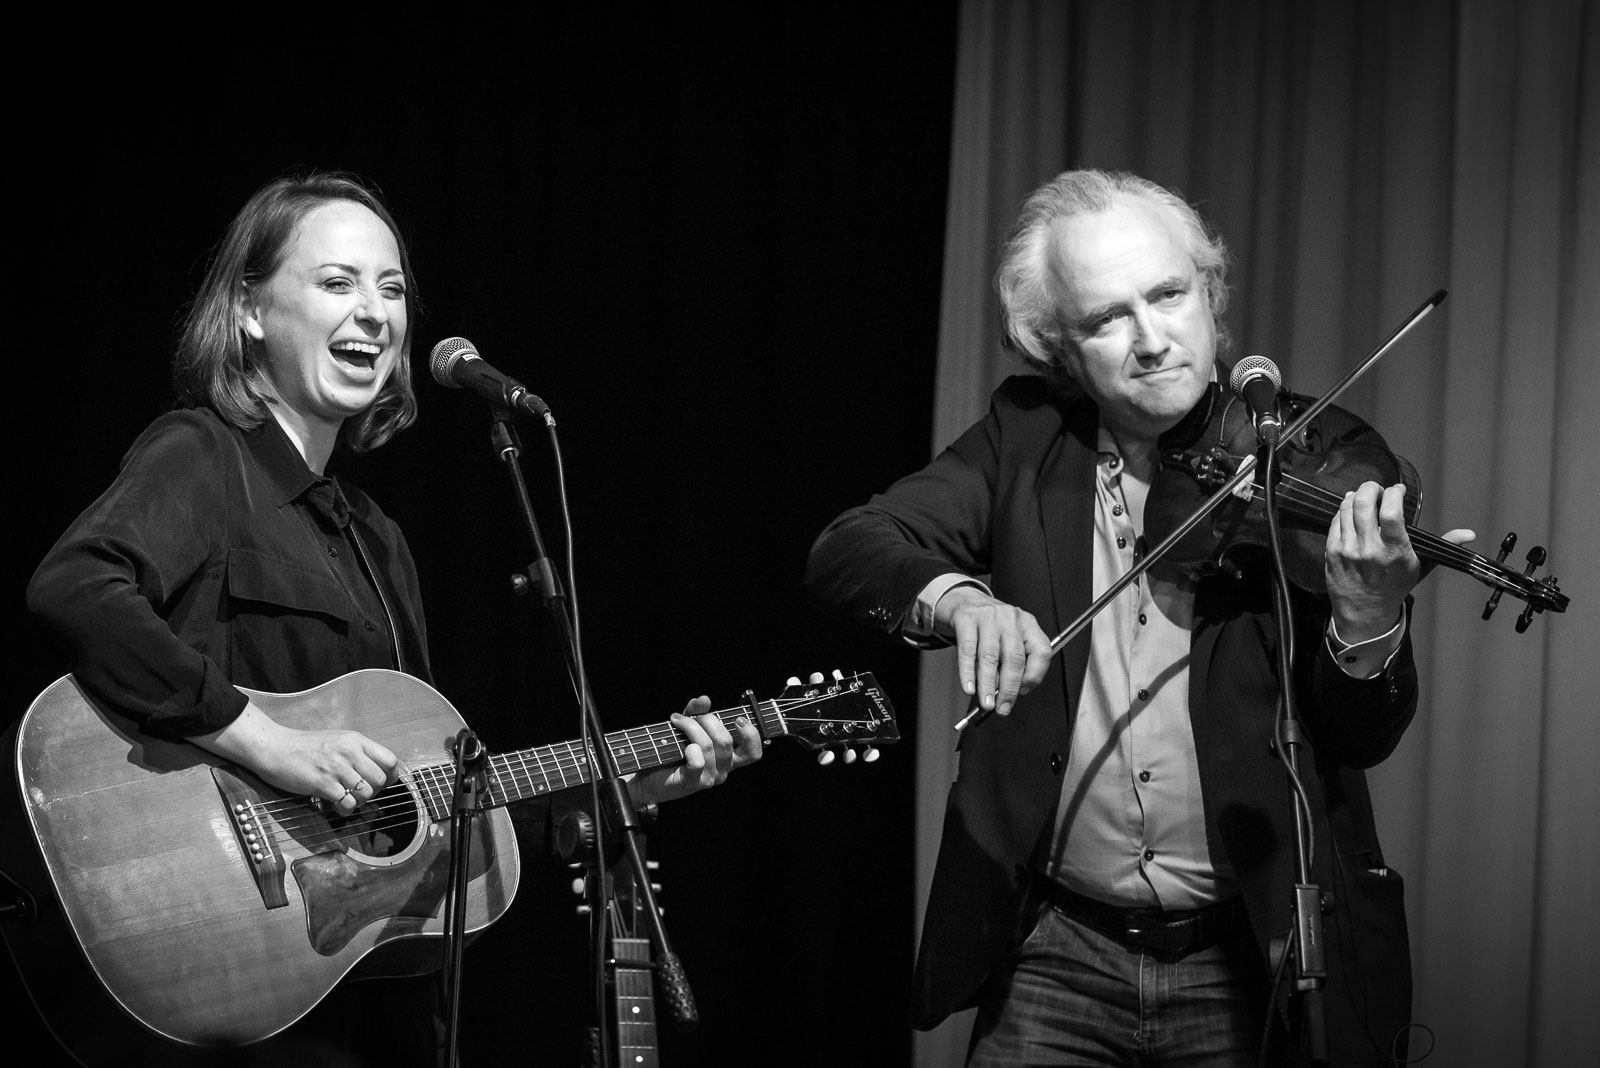 Stephanie Struijk met Joost van Es Parelsessies Concertfoto